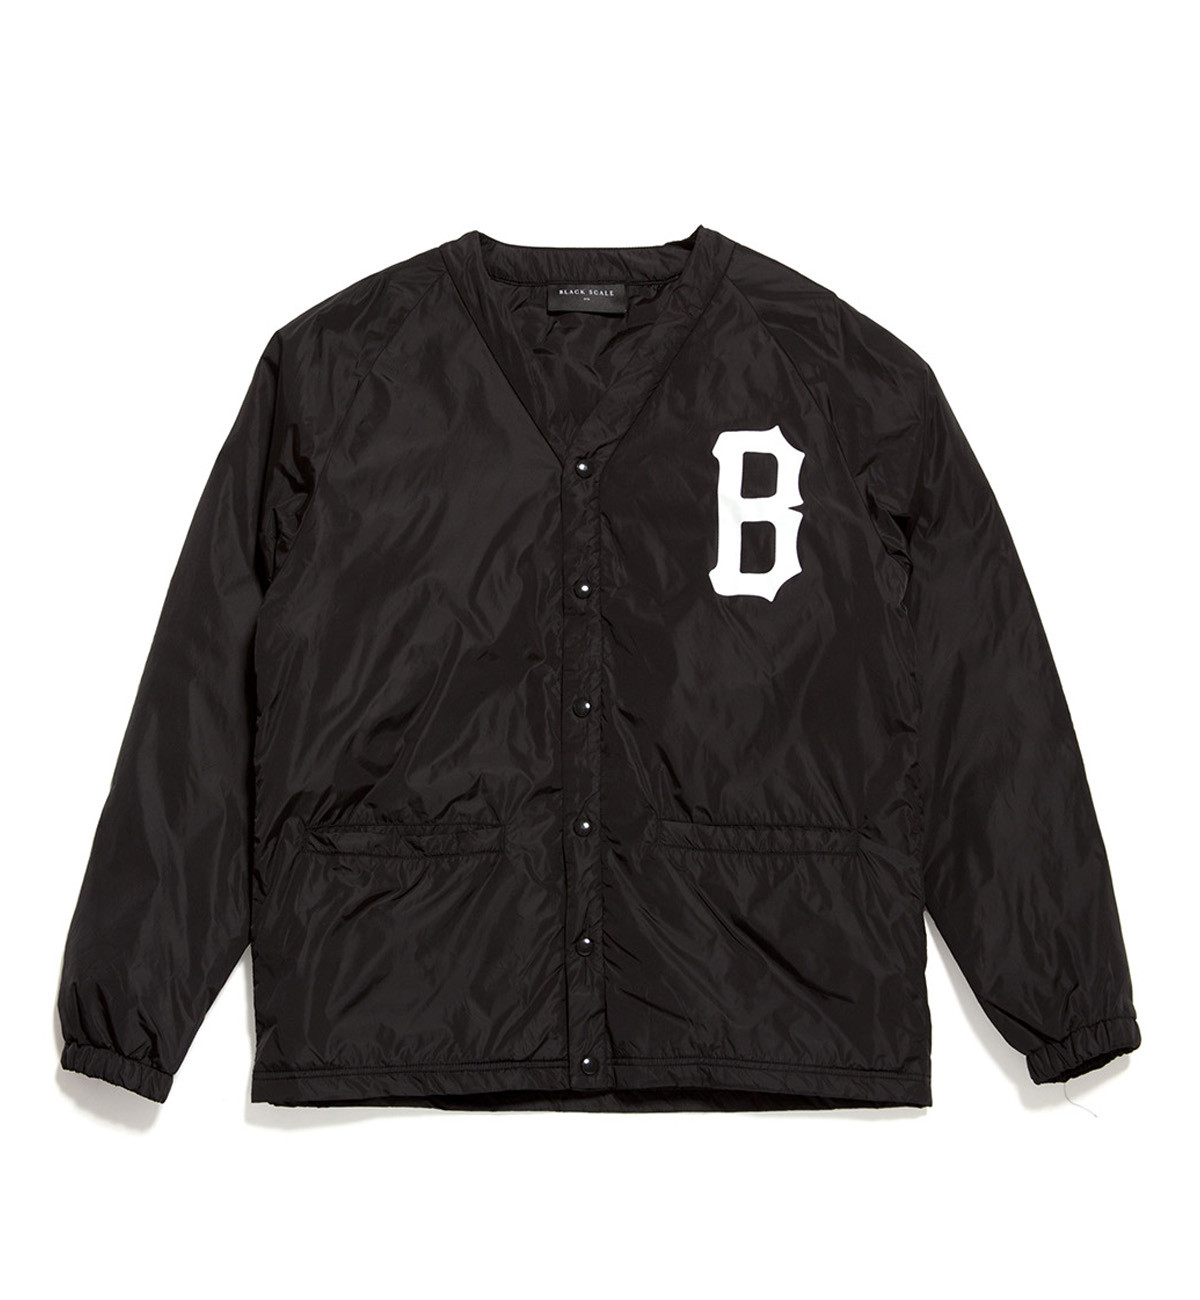 bf16lw31